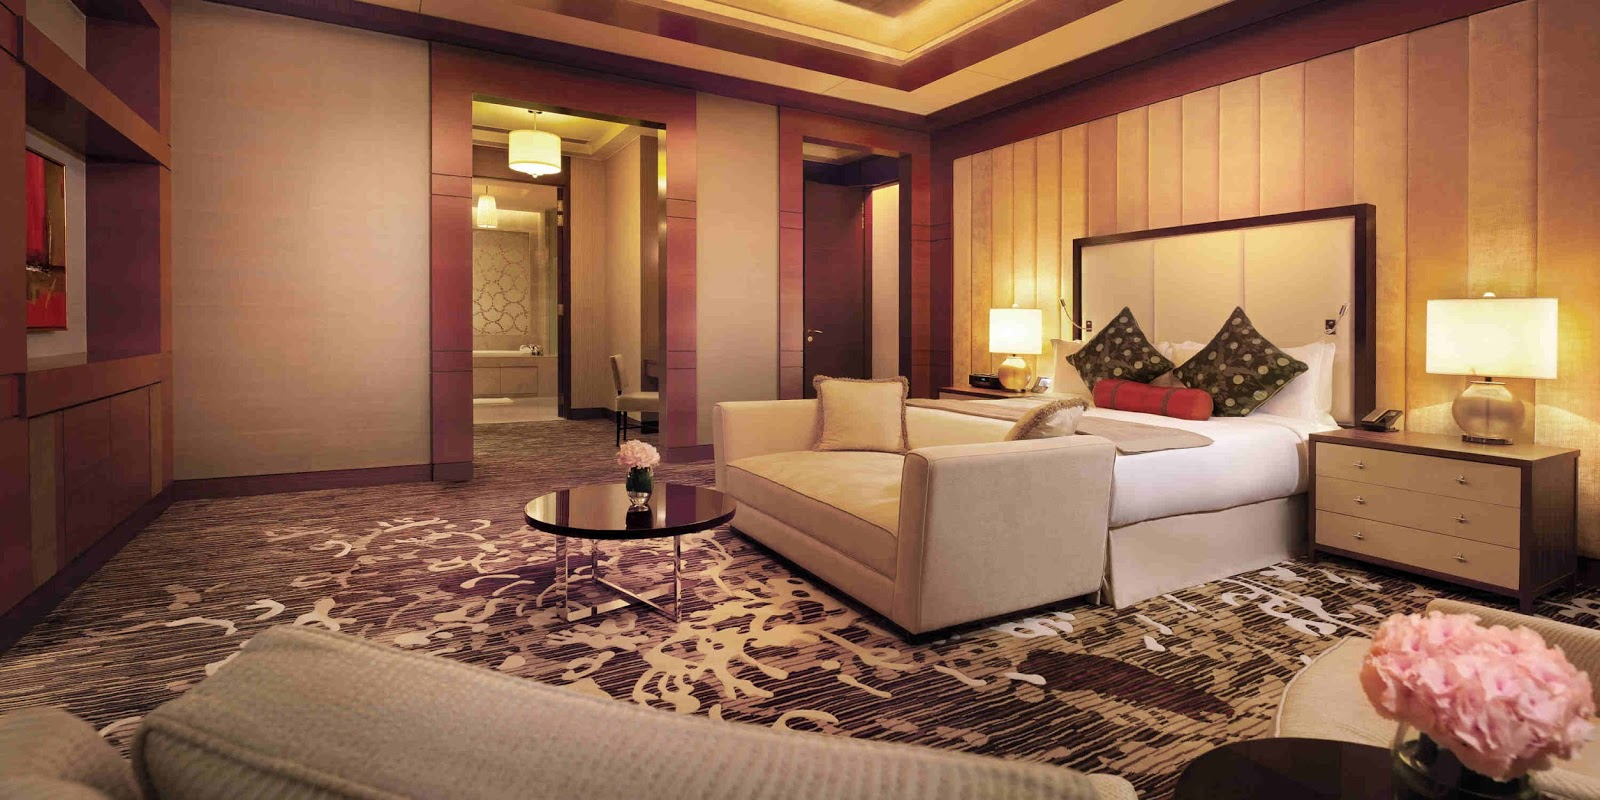 Married - Marina Bay Sands Bridal Suite (Marina Suite) - Mel Ben ...